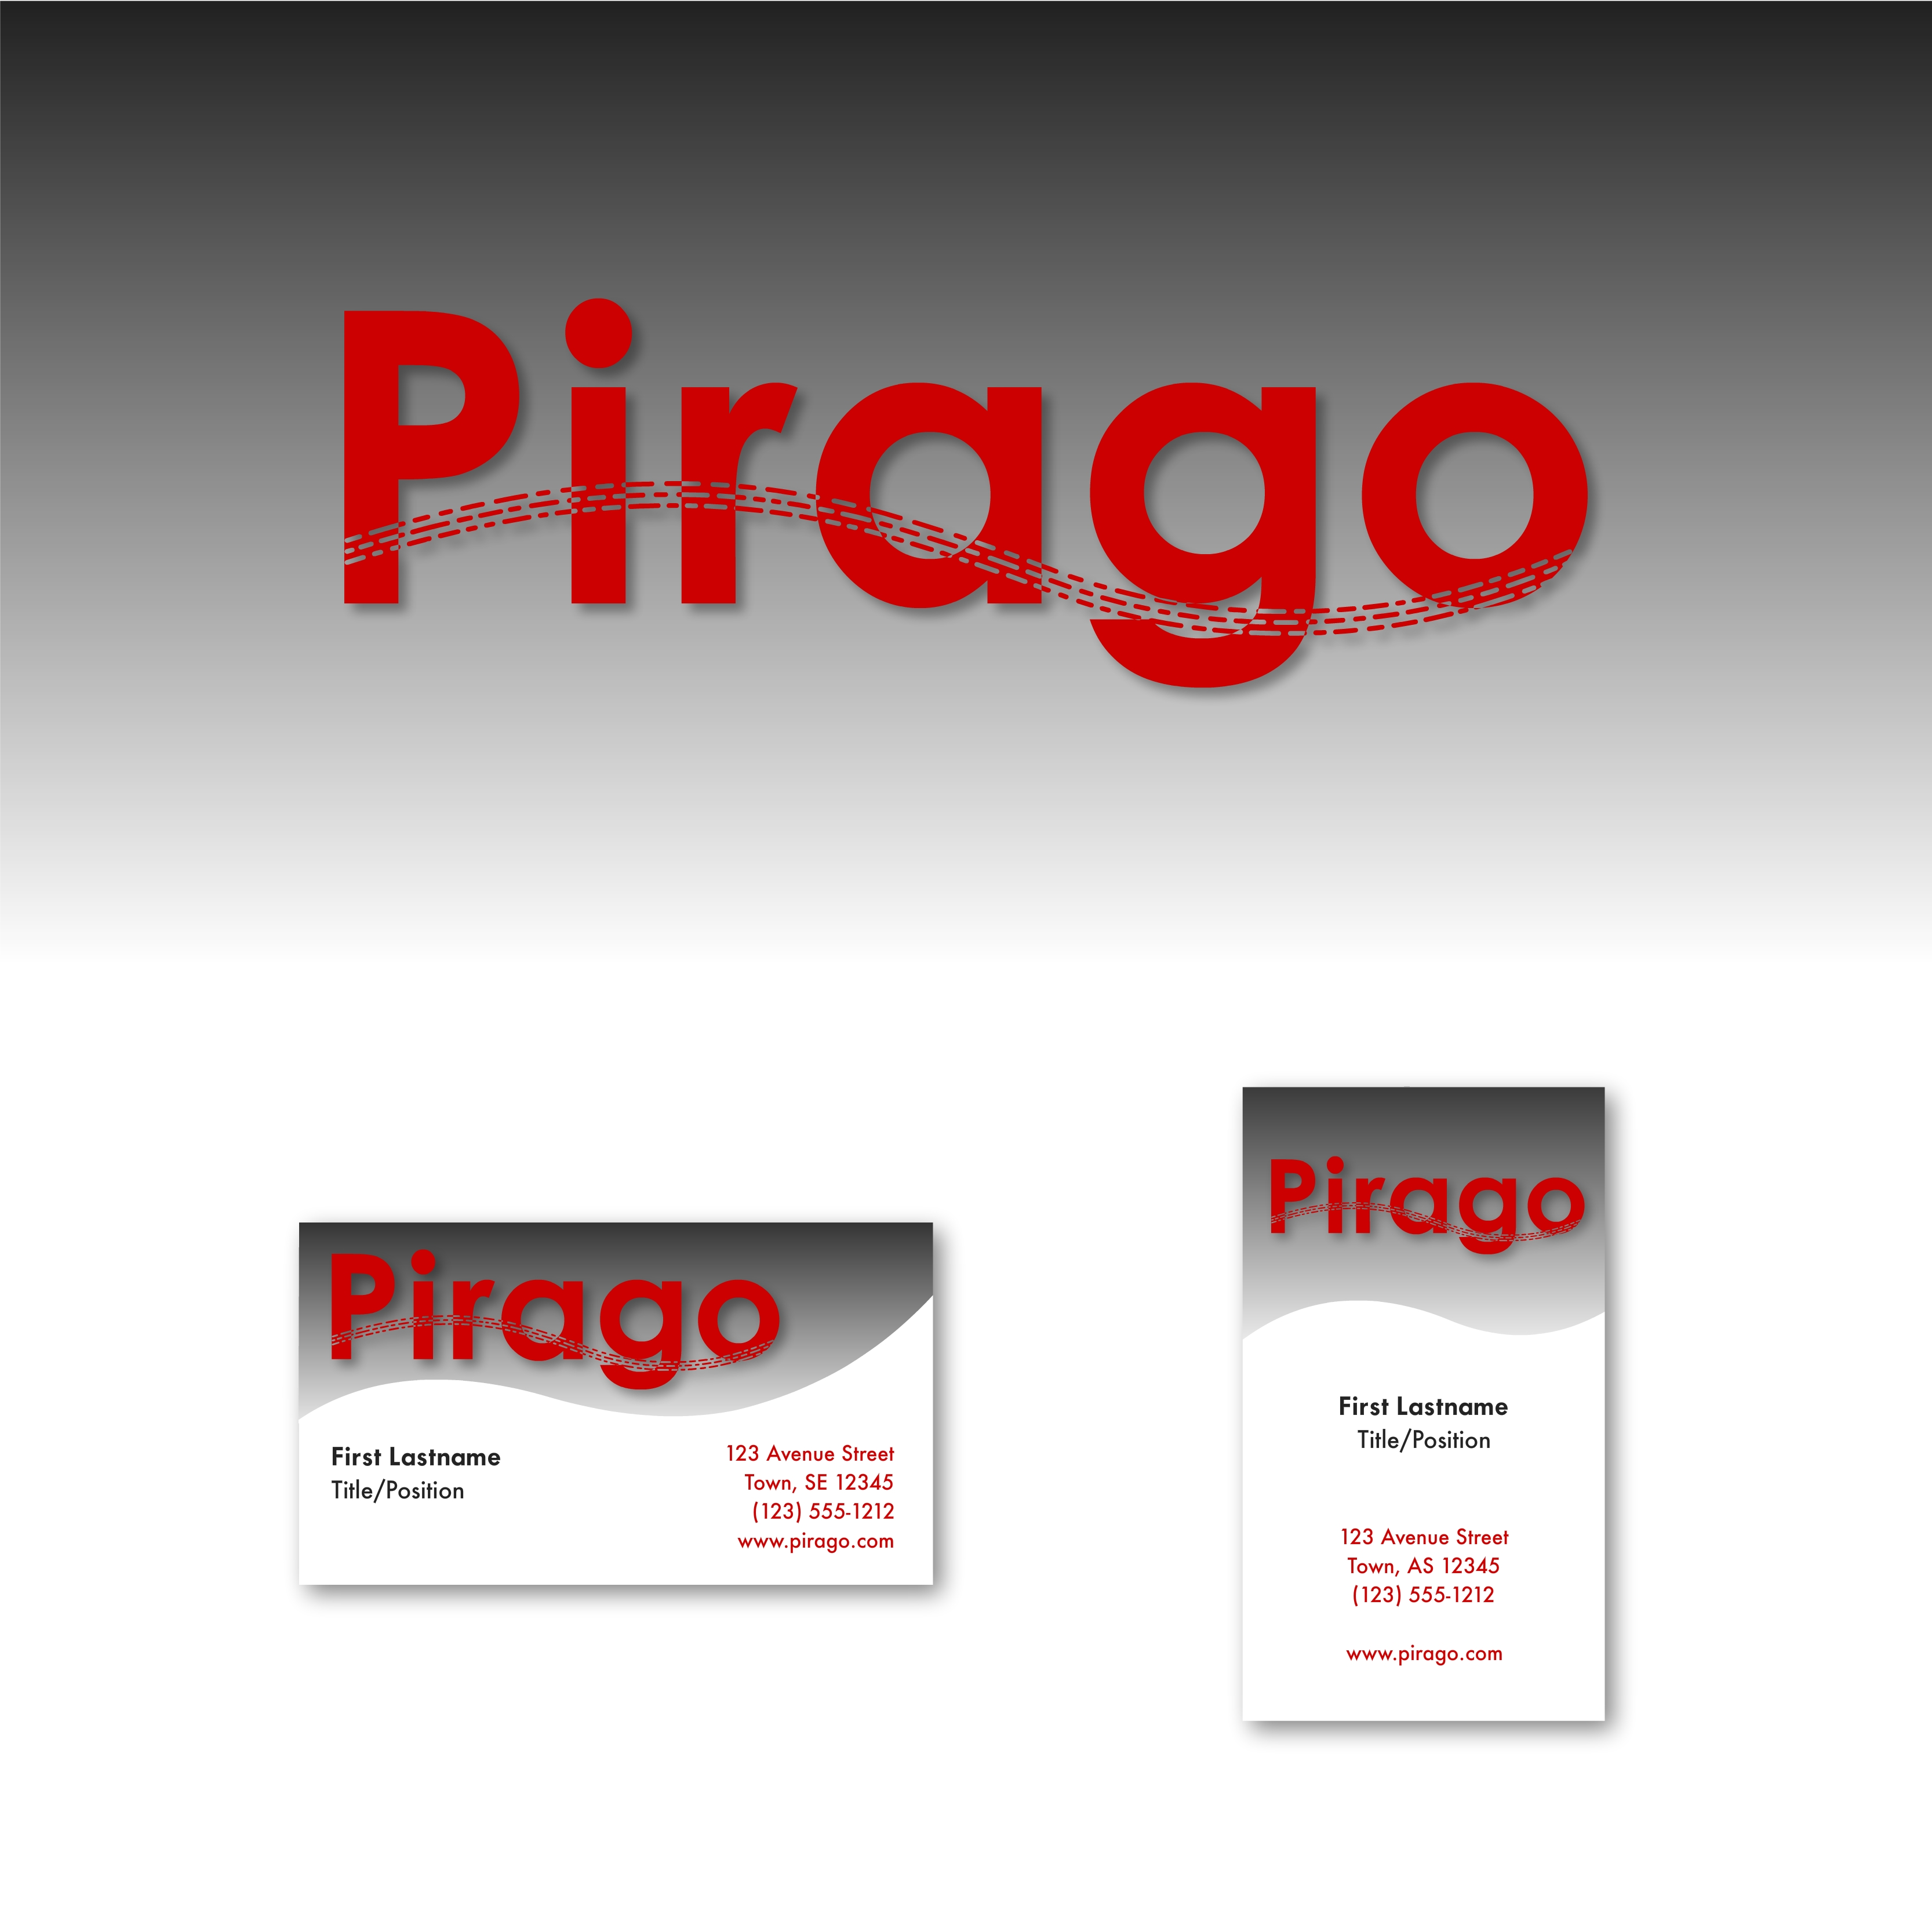 PIRAGO